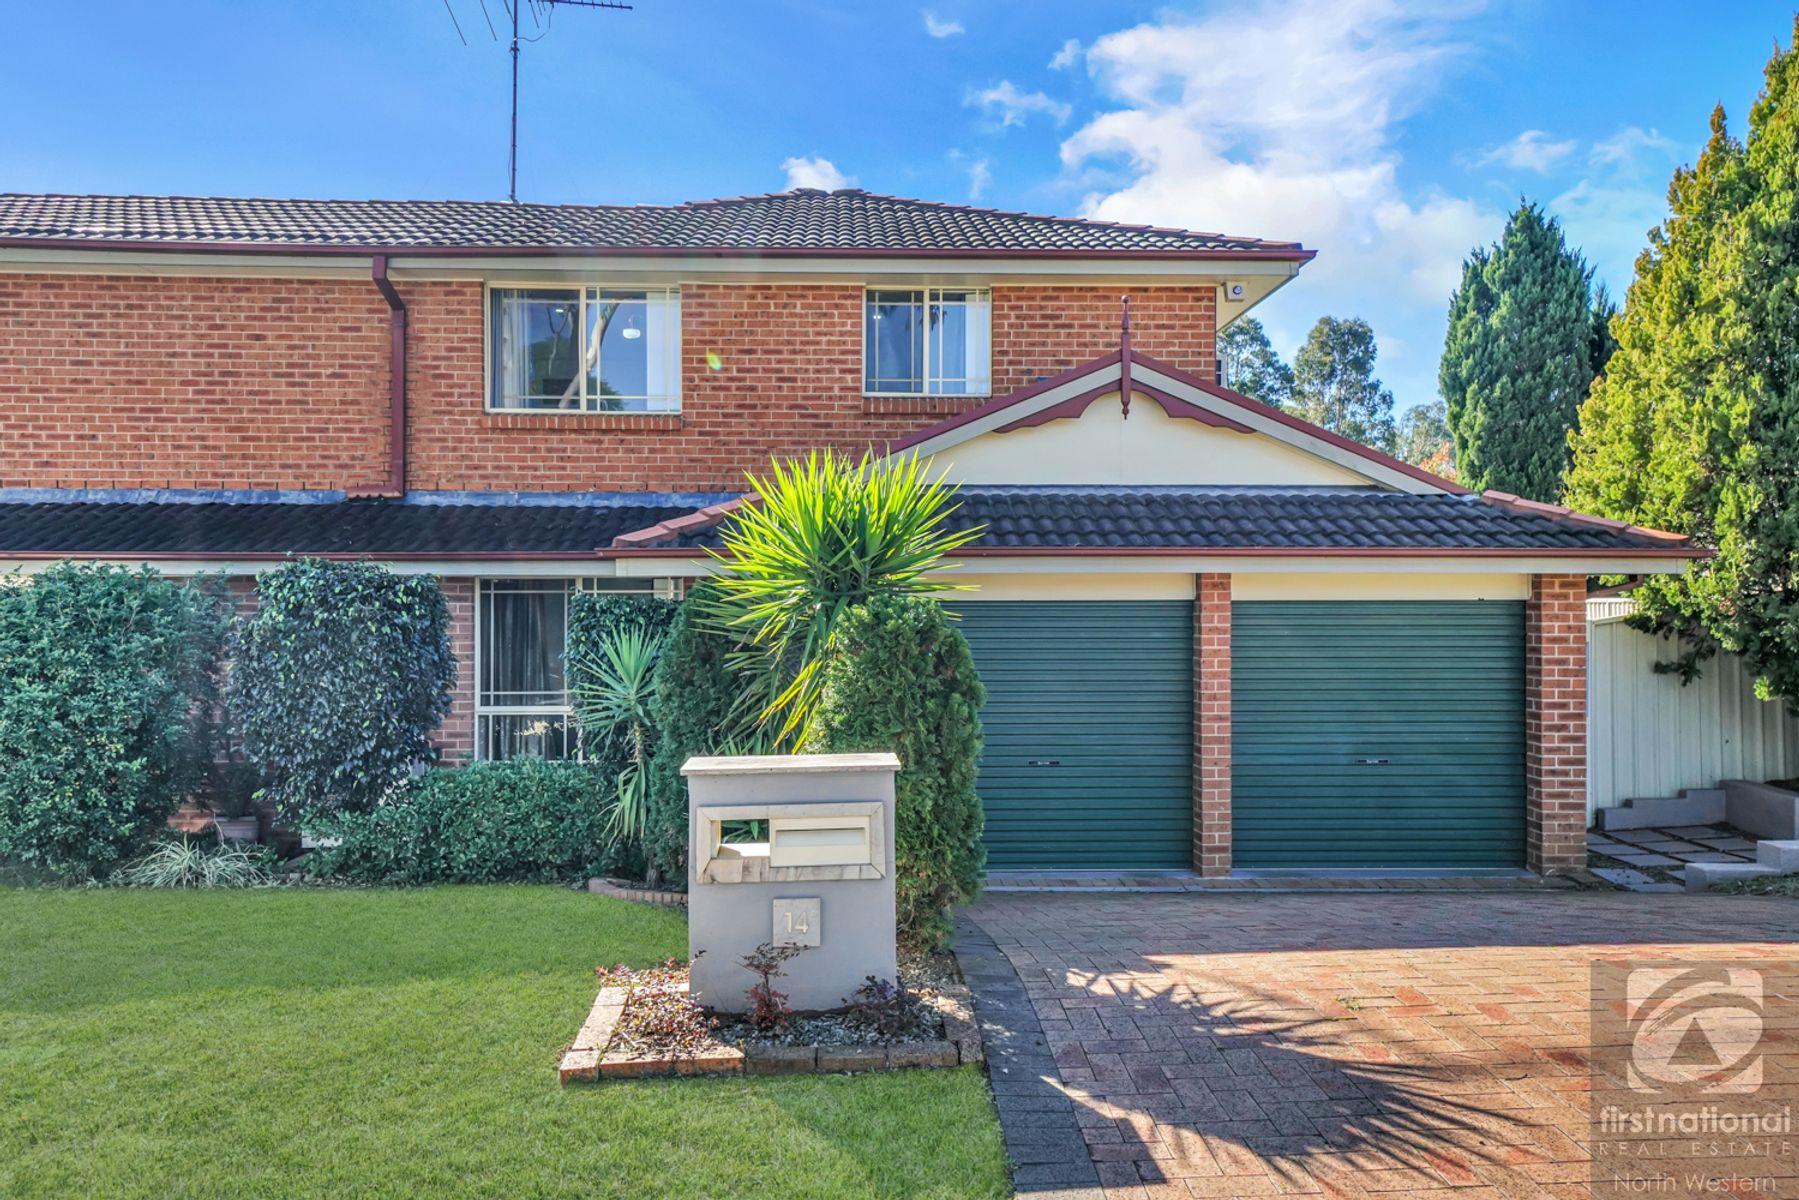 14 Ponytail Drive, Stanhope Gardens, NSW 2768